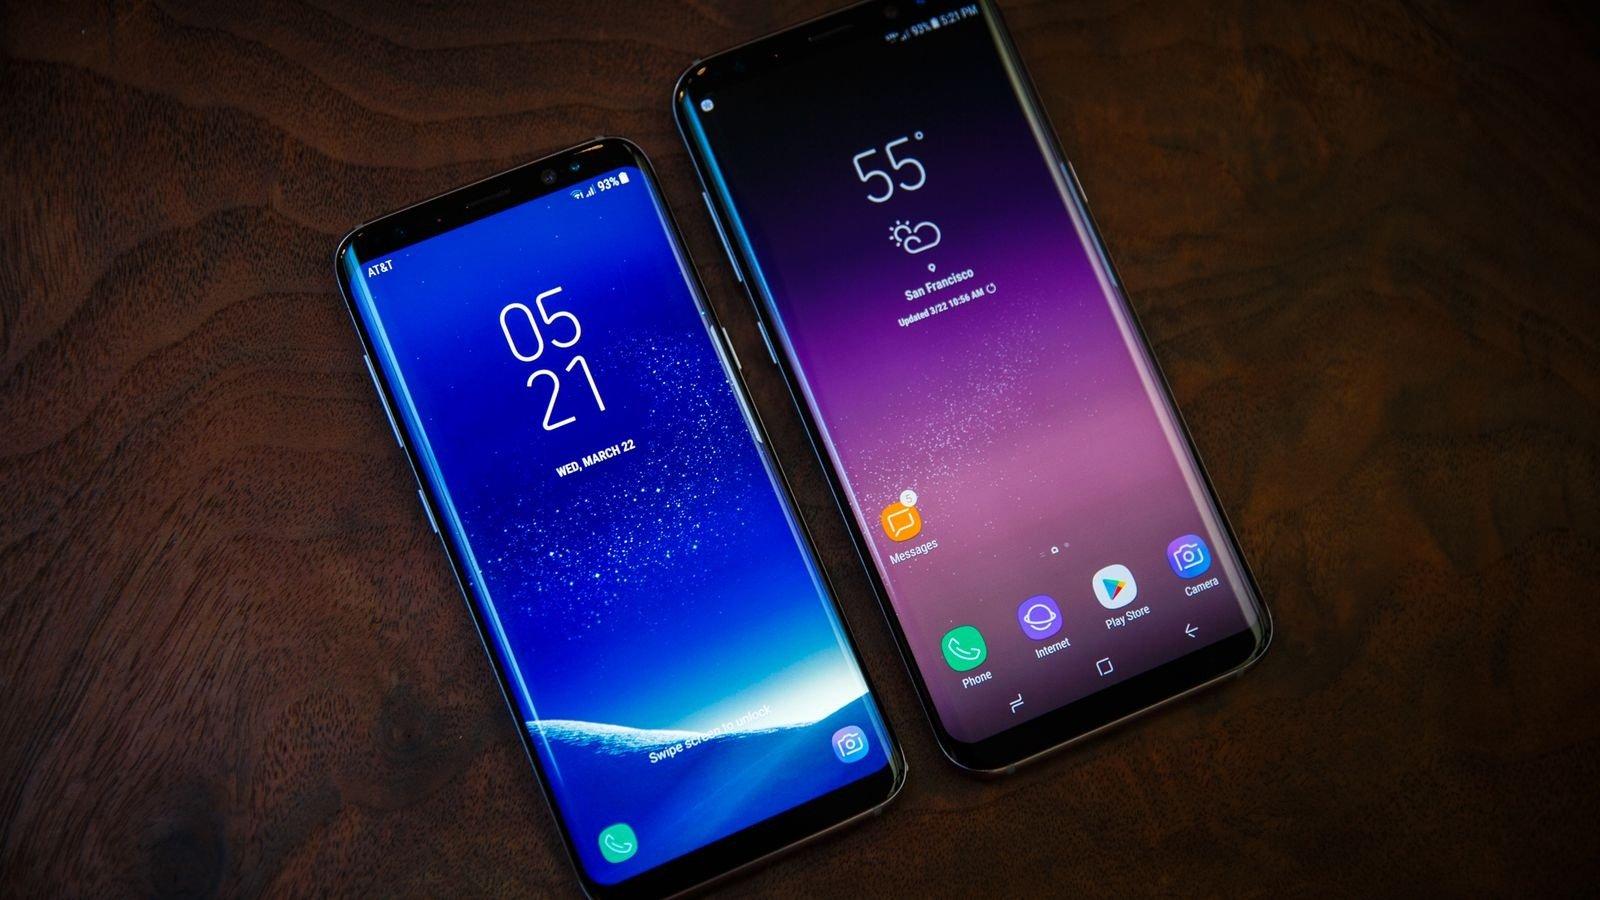 Самсунг представит последние модели влинейке Galaxy S